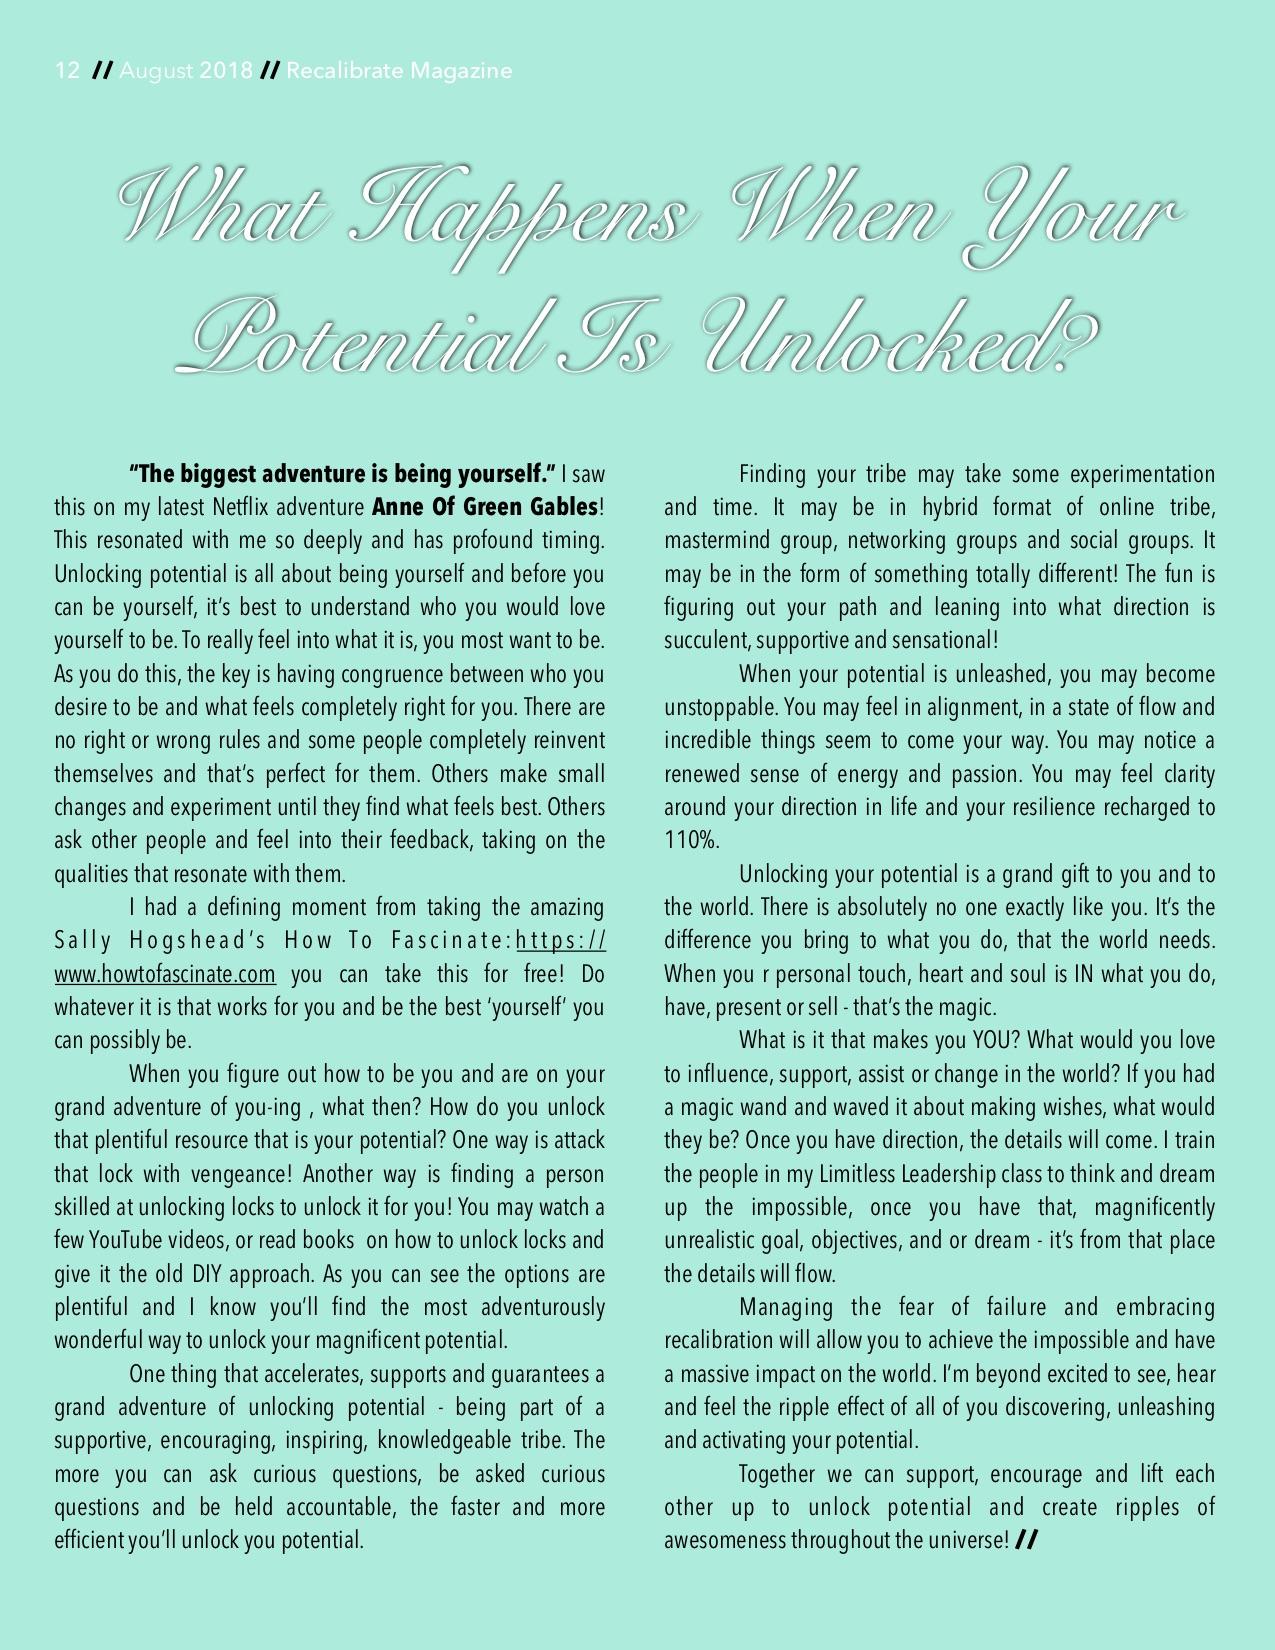 Recalibrate MAGAZINE Page12.jpg